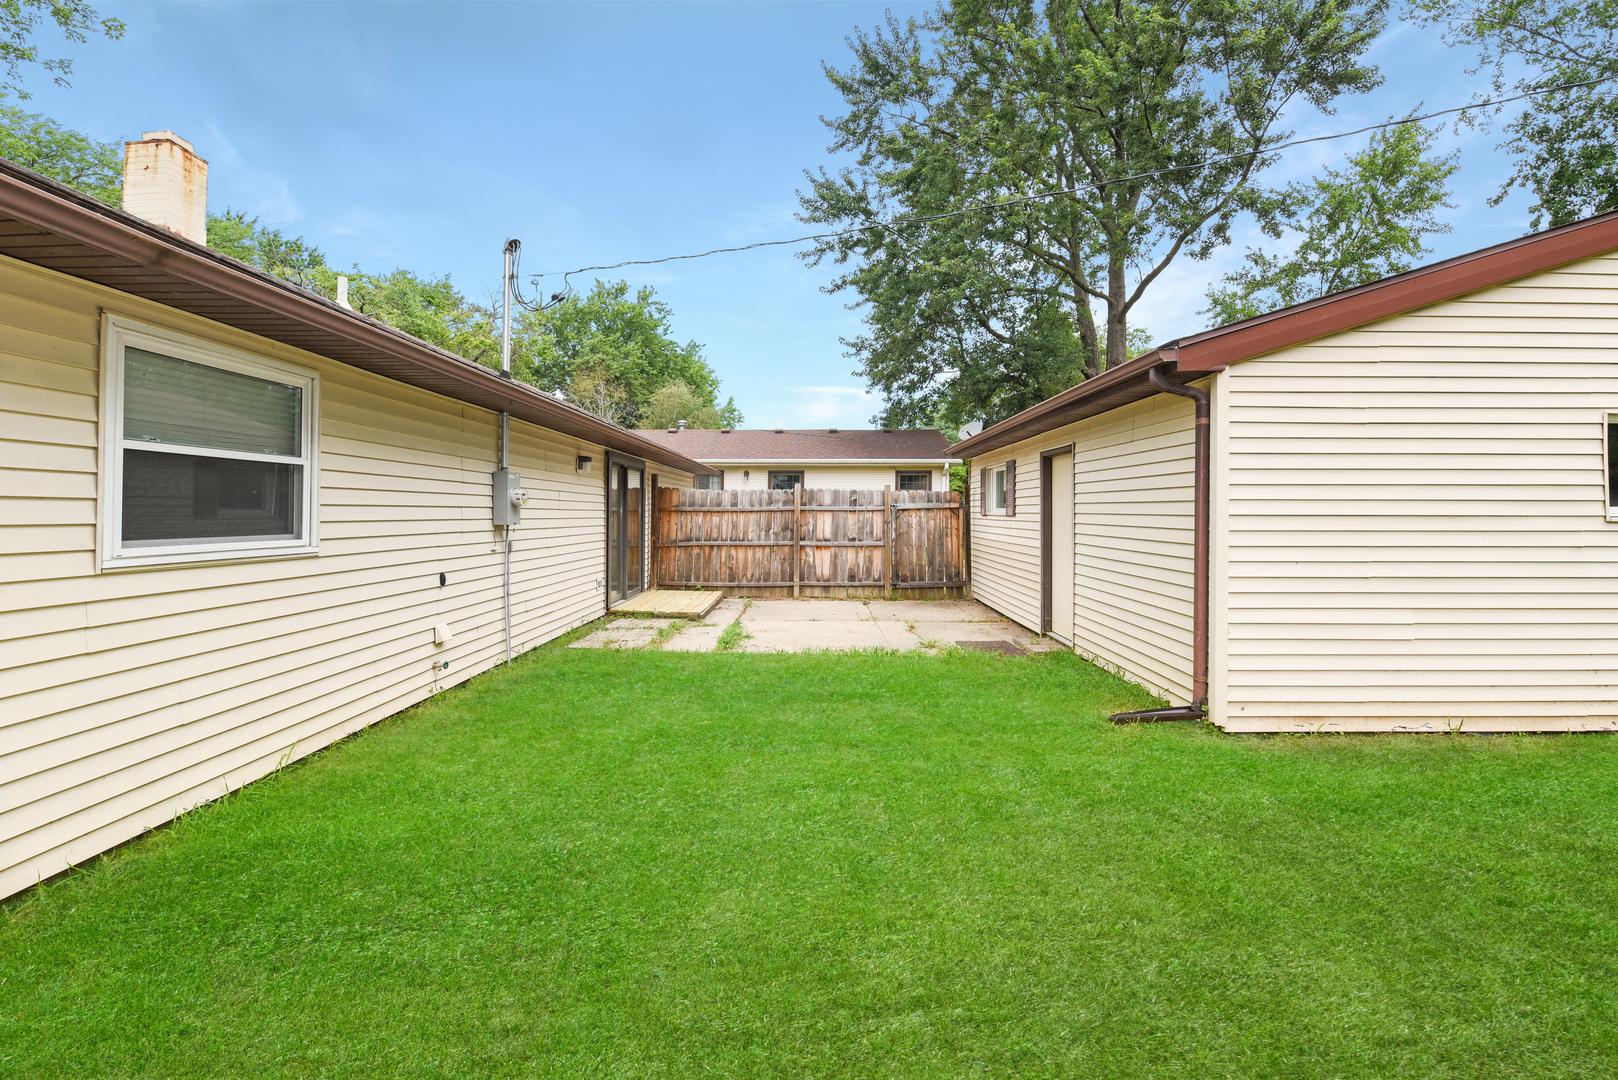 1008 Frank, Champaign, Illinois, 61821